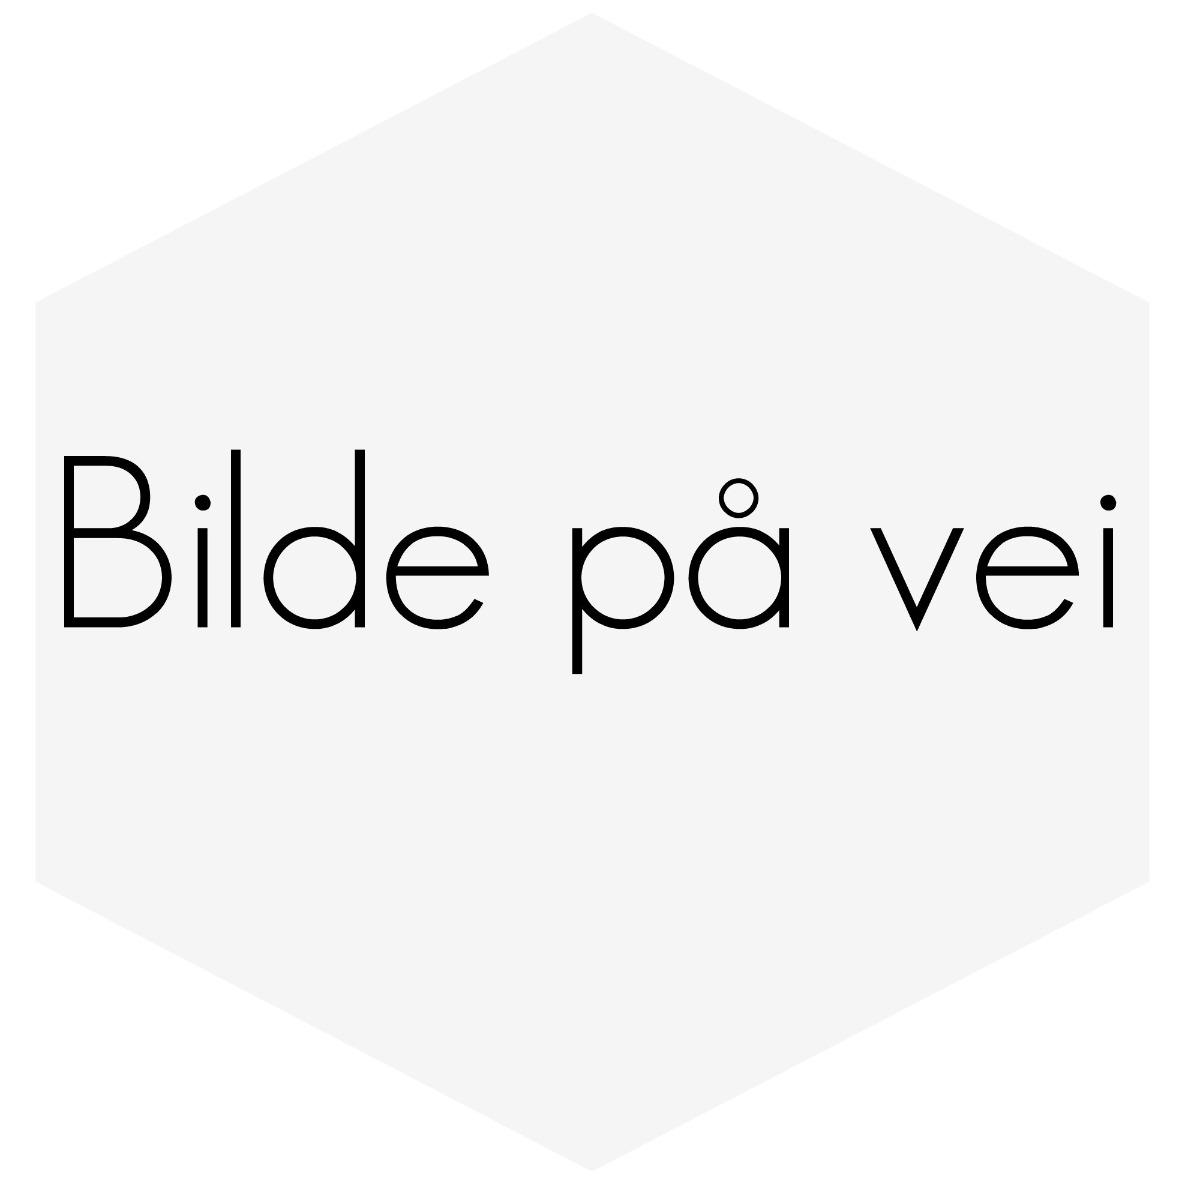 SPOILERLAMPE/FOGLAMP VOLVO 960-95-97 S/V90 HØYRE 9171064